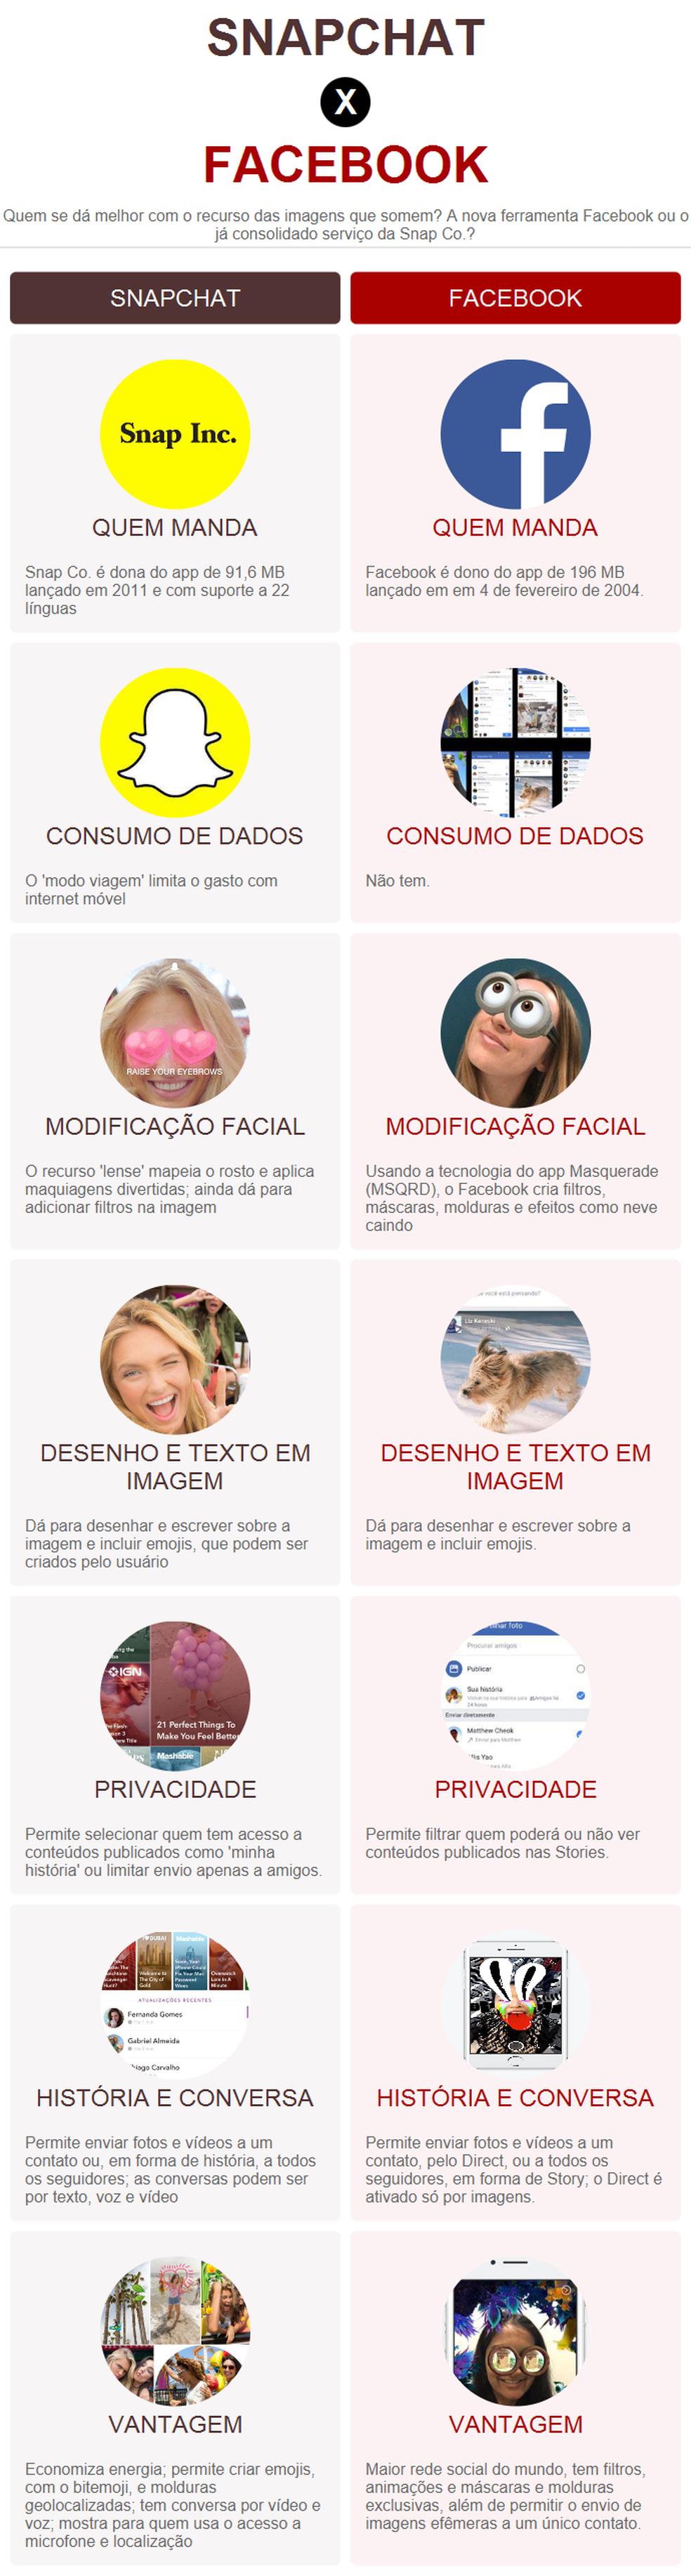 Comparativo Snapchat x Facebook (Foto: Arte / G1)